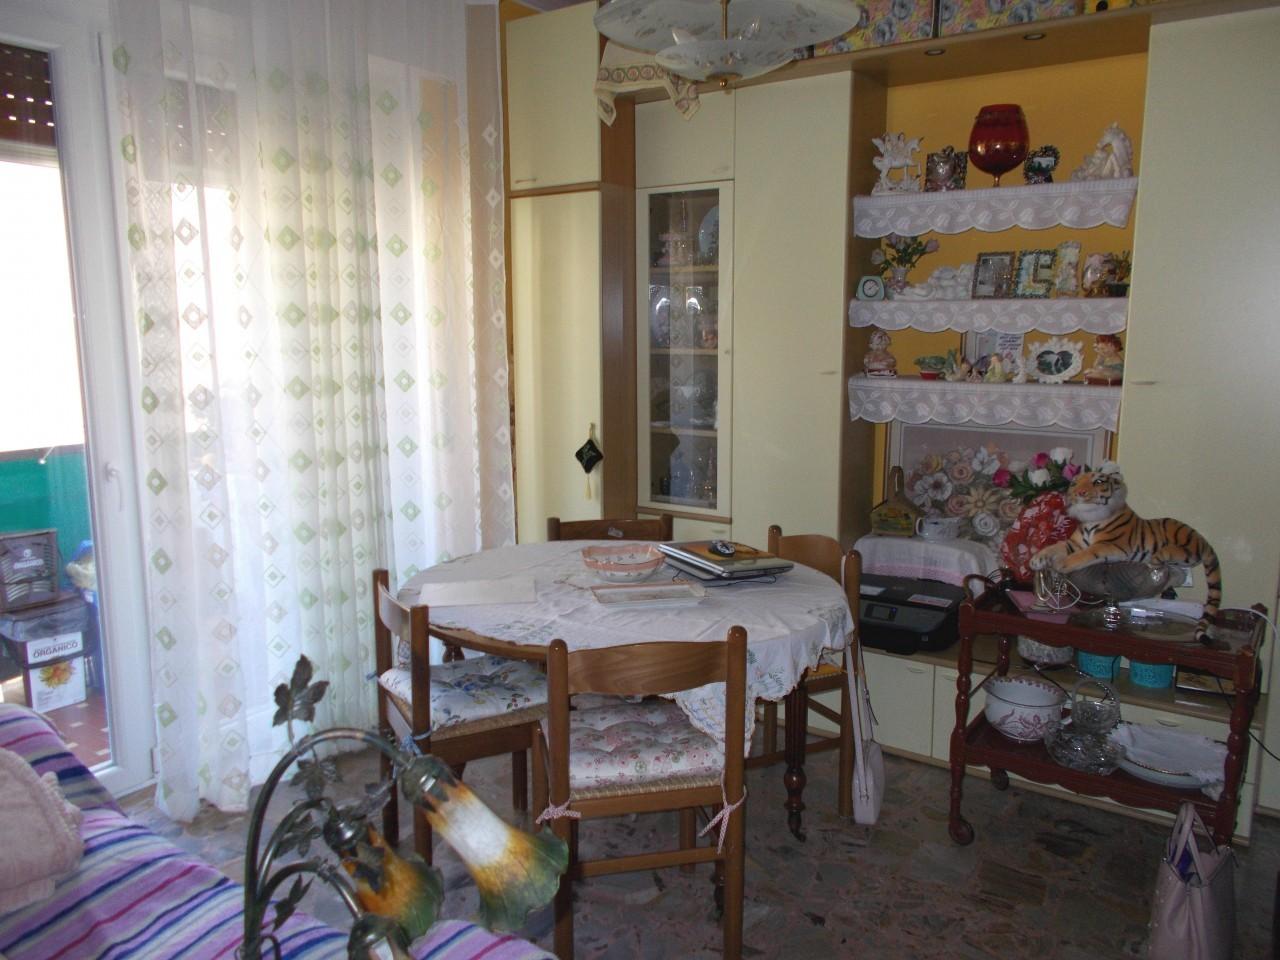 Sanremo, Via Dante, appartamento con cantina